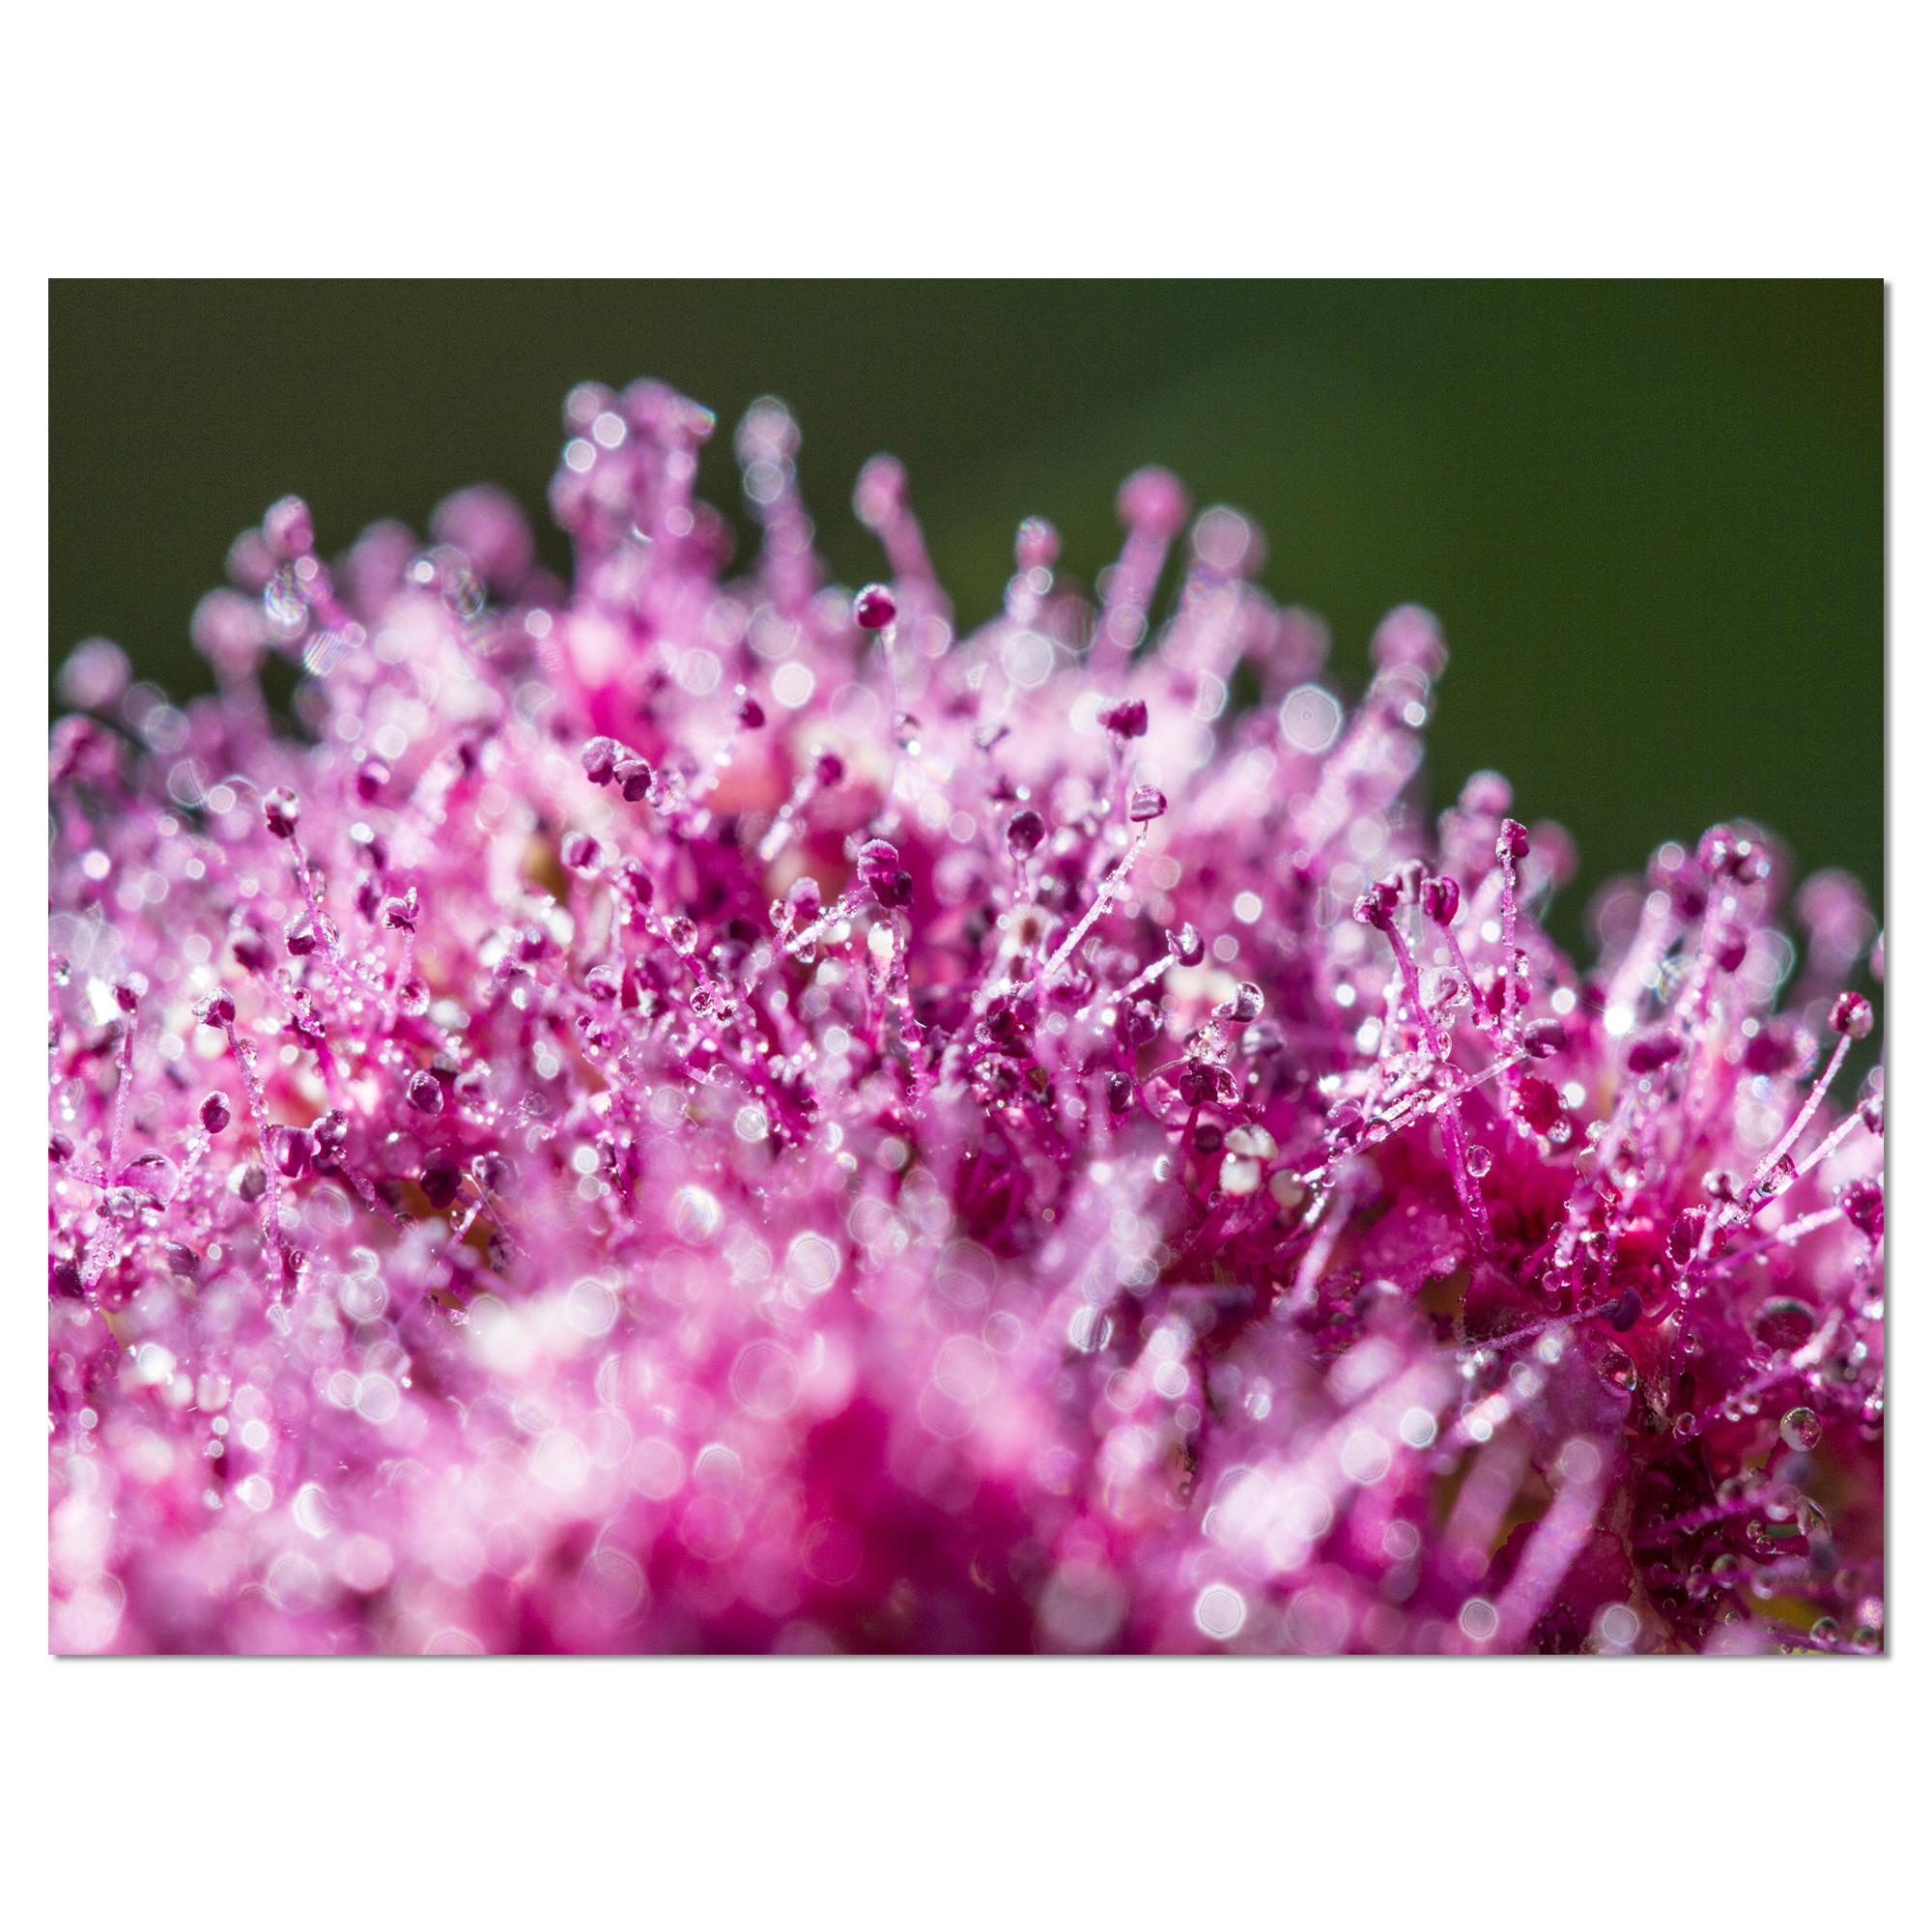 Pink Little Flowers Close up View - Large Floral Wall Art Canvas - image 2 de 3